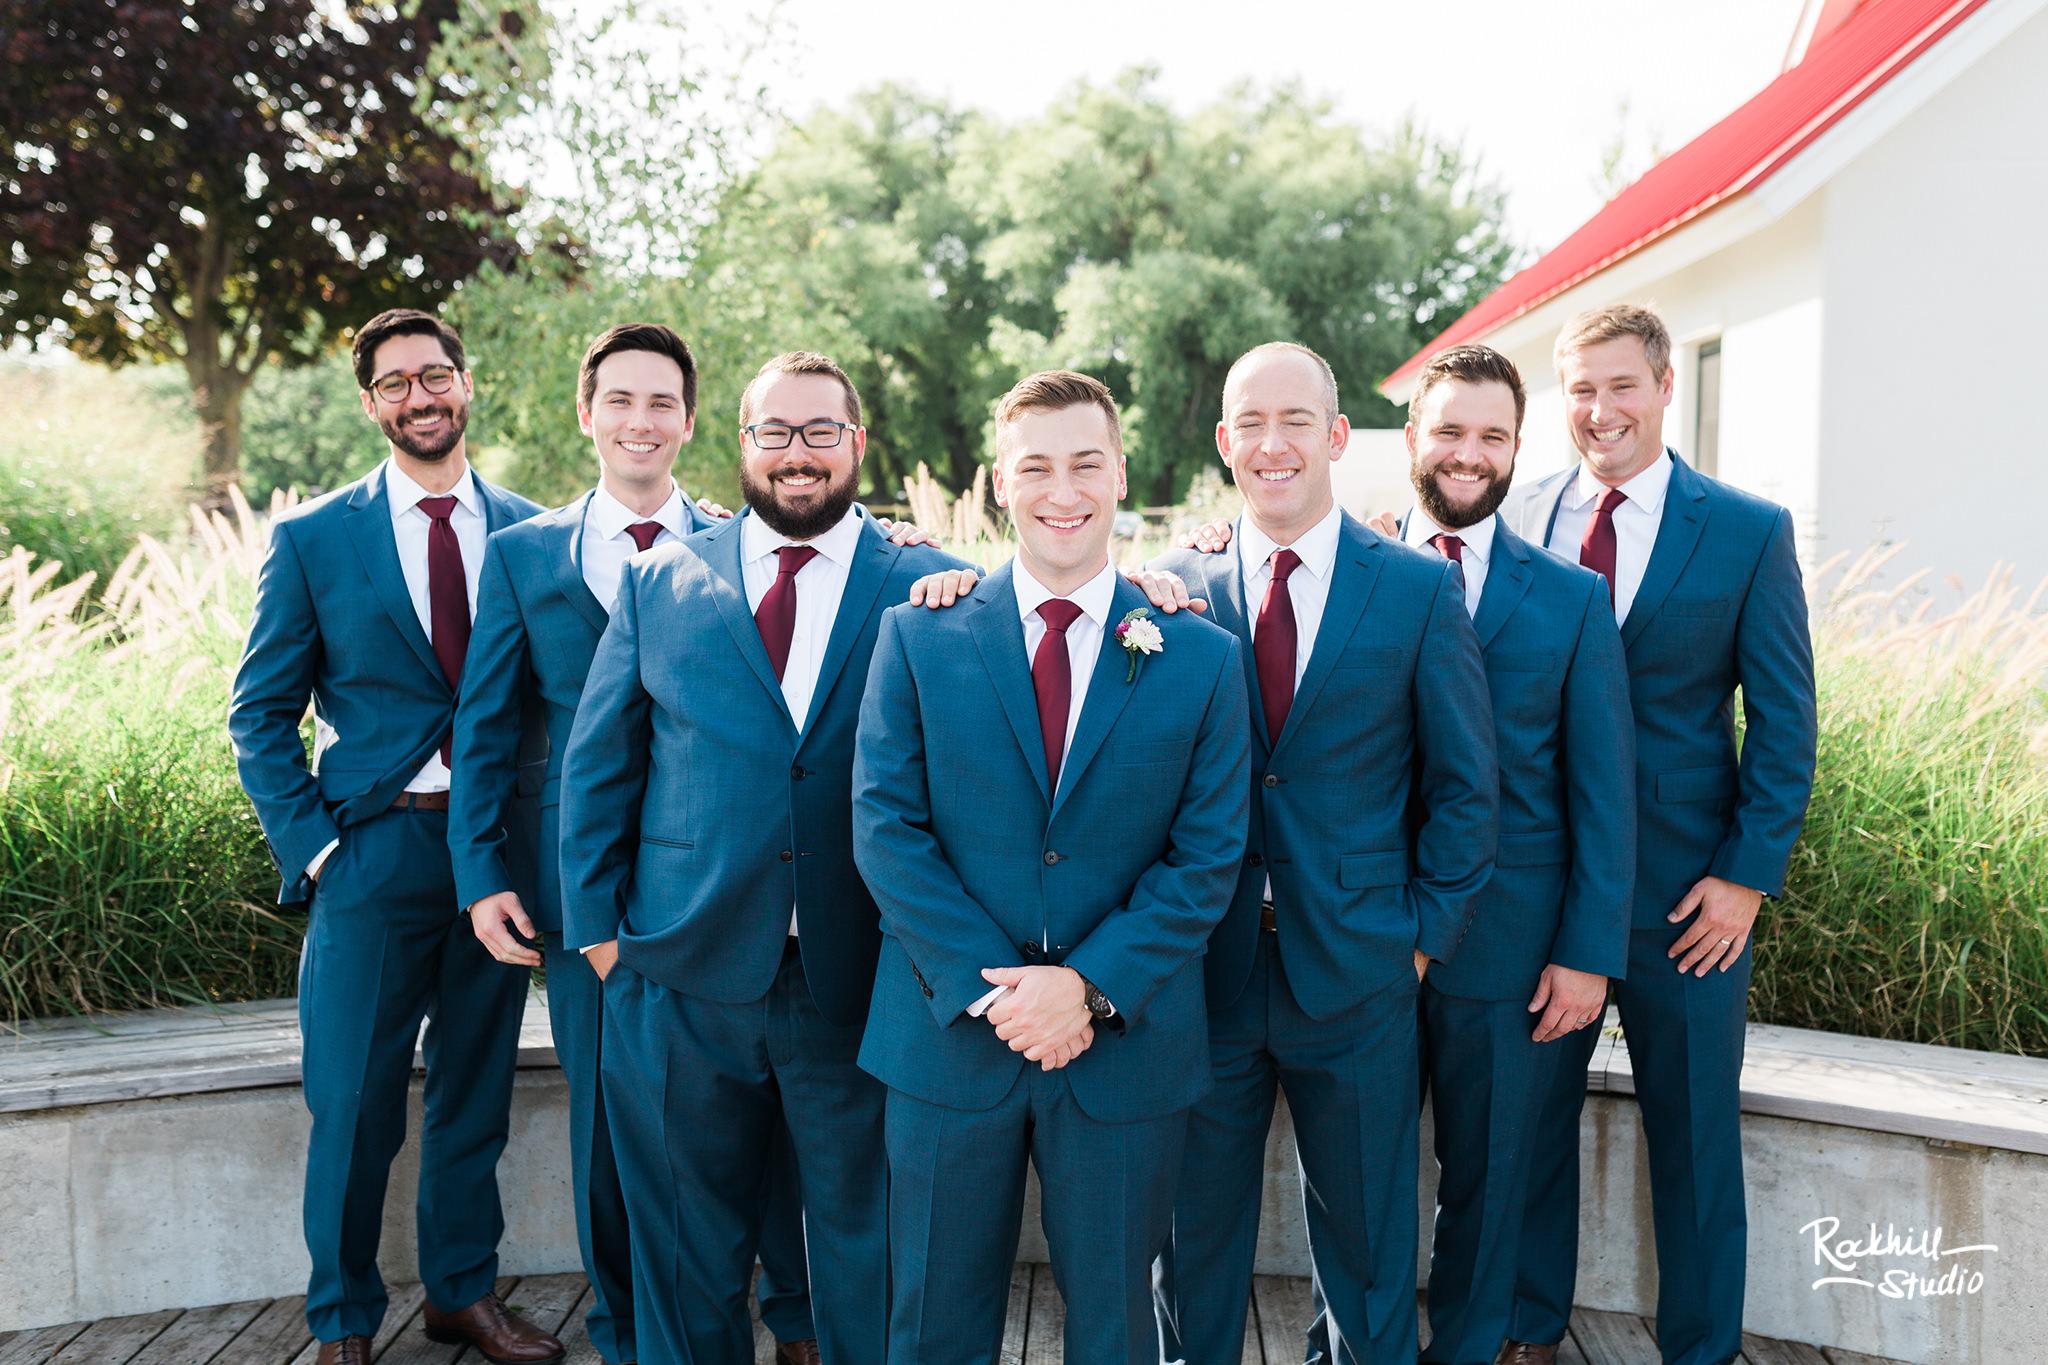 Northport michigan groomsmen, traverse city wedding photographer rockhill studio